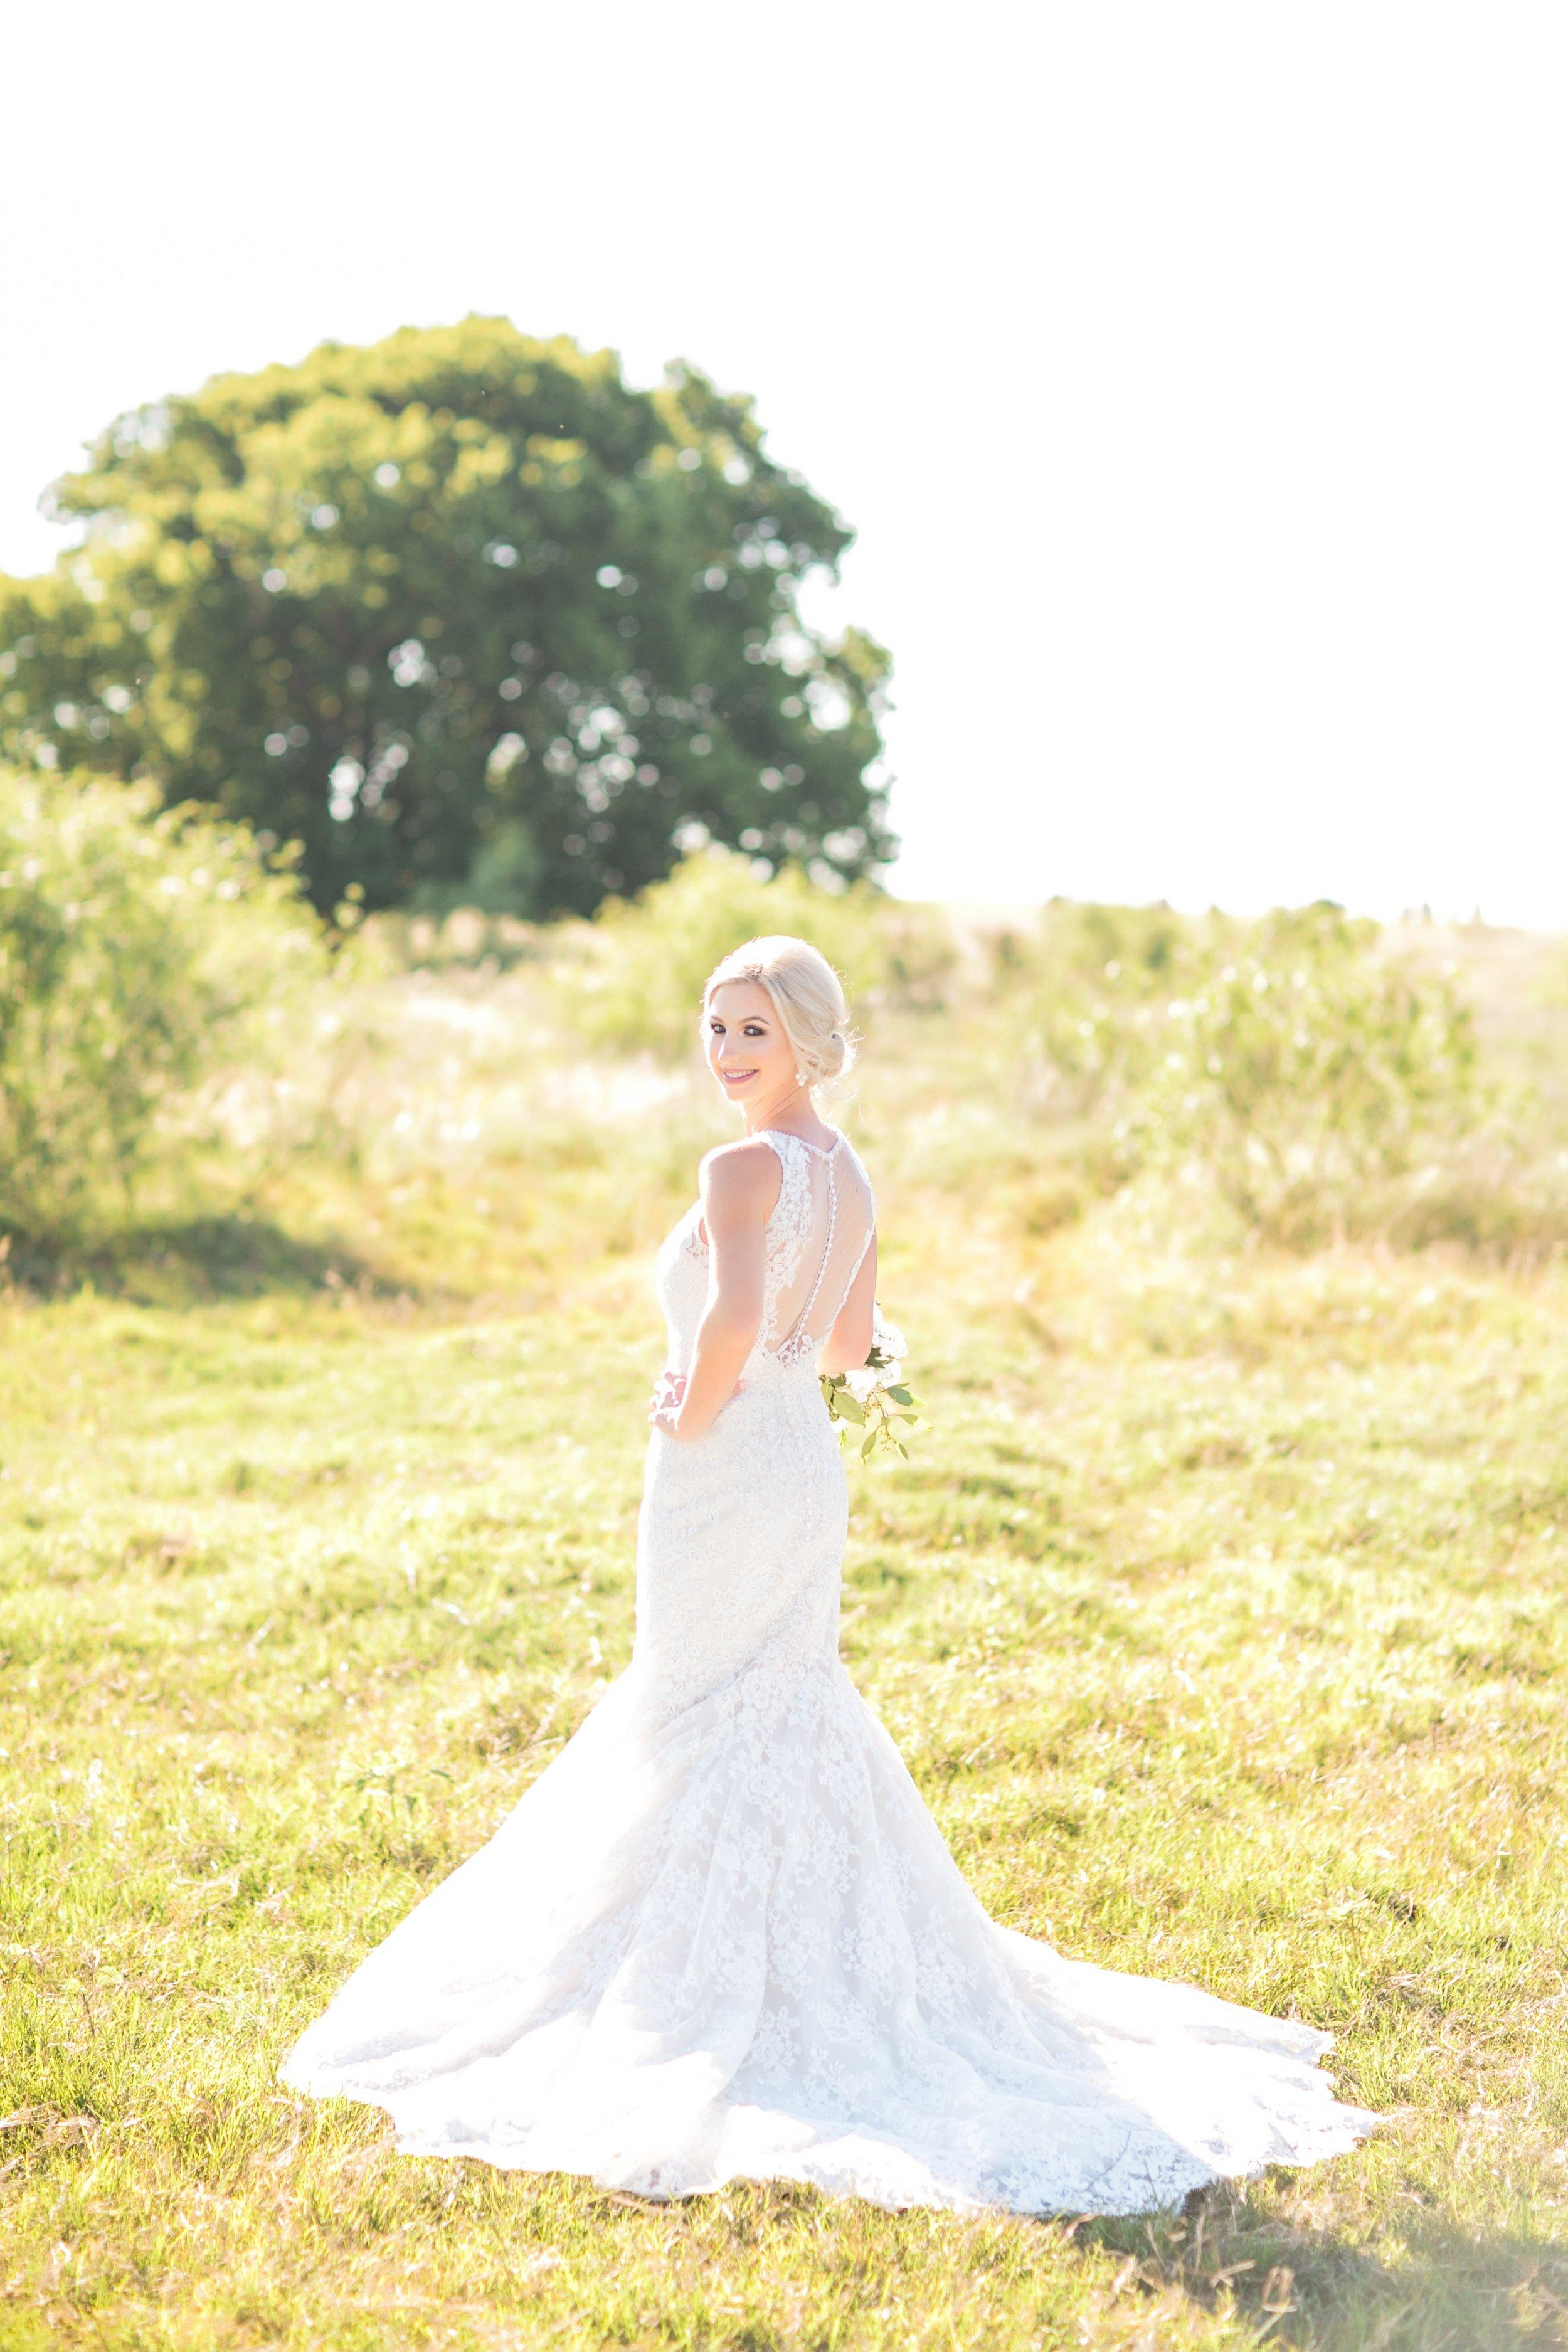 Lexi-bridals-035.JPG